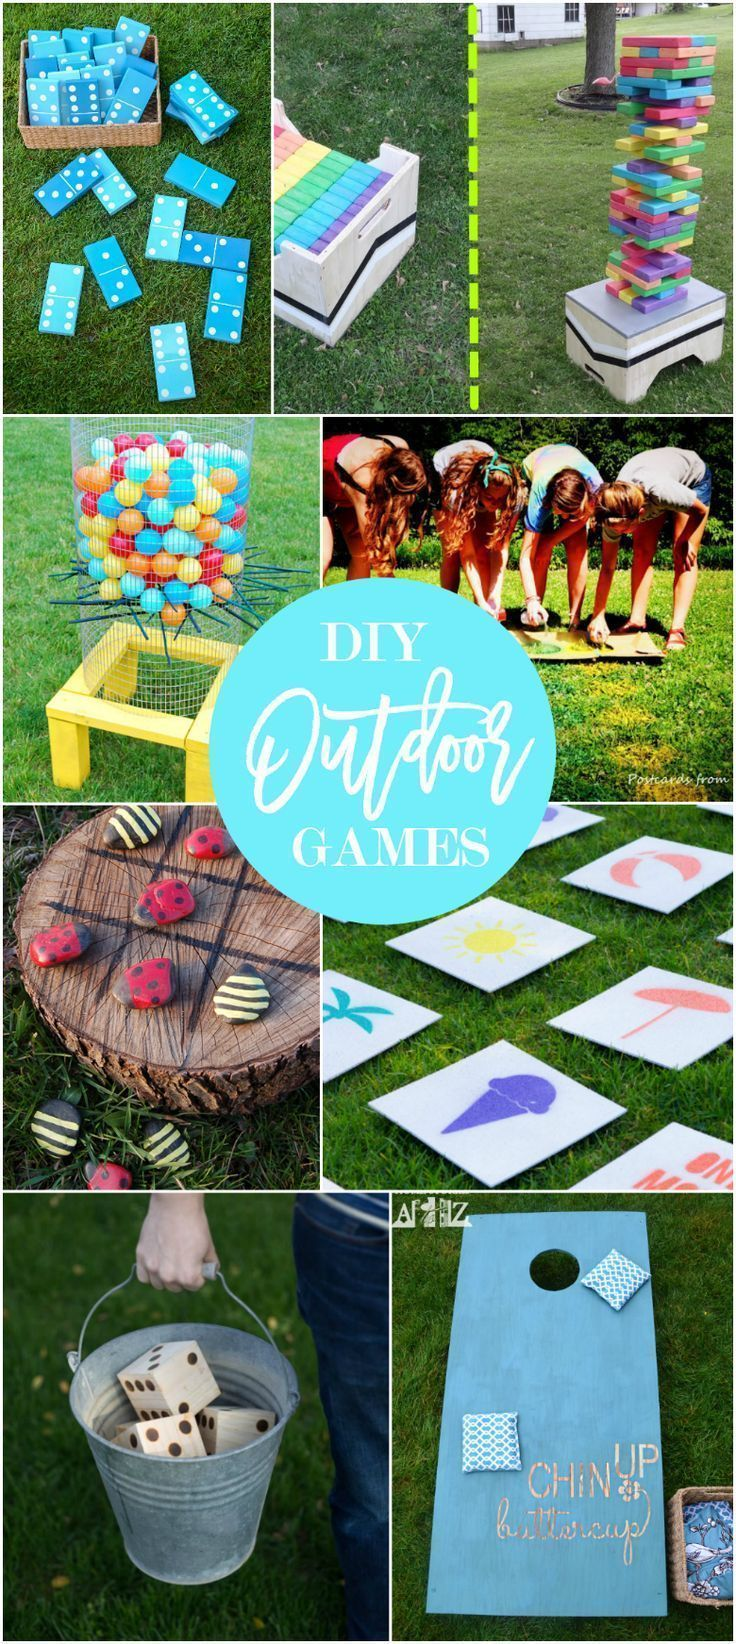 17 diy games for outdoor family fun summer lovin pinterest spiele kinder und garten. Black Bedroom Furniture Sets. Home Design Ideas